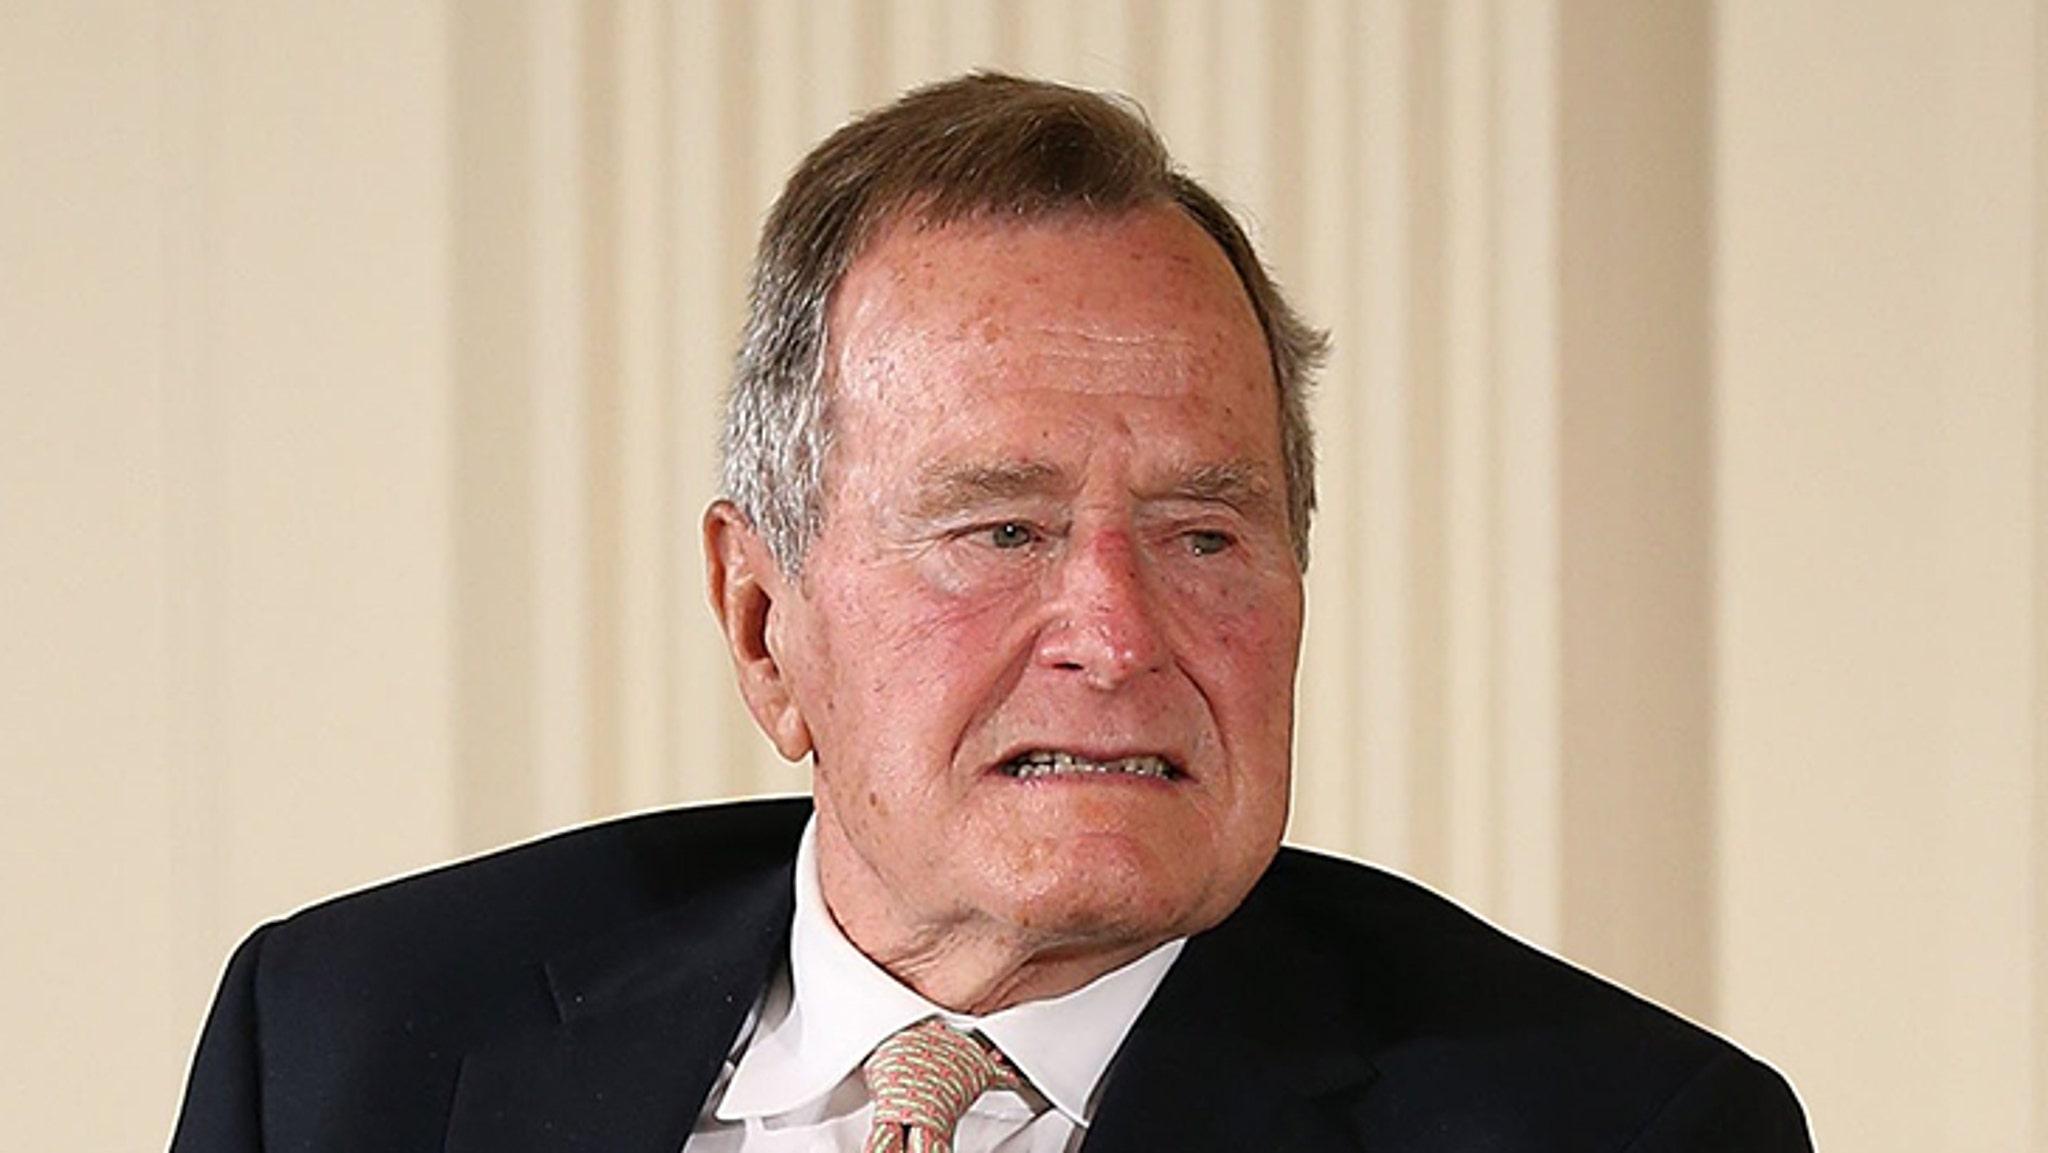 Bush die fucking george w